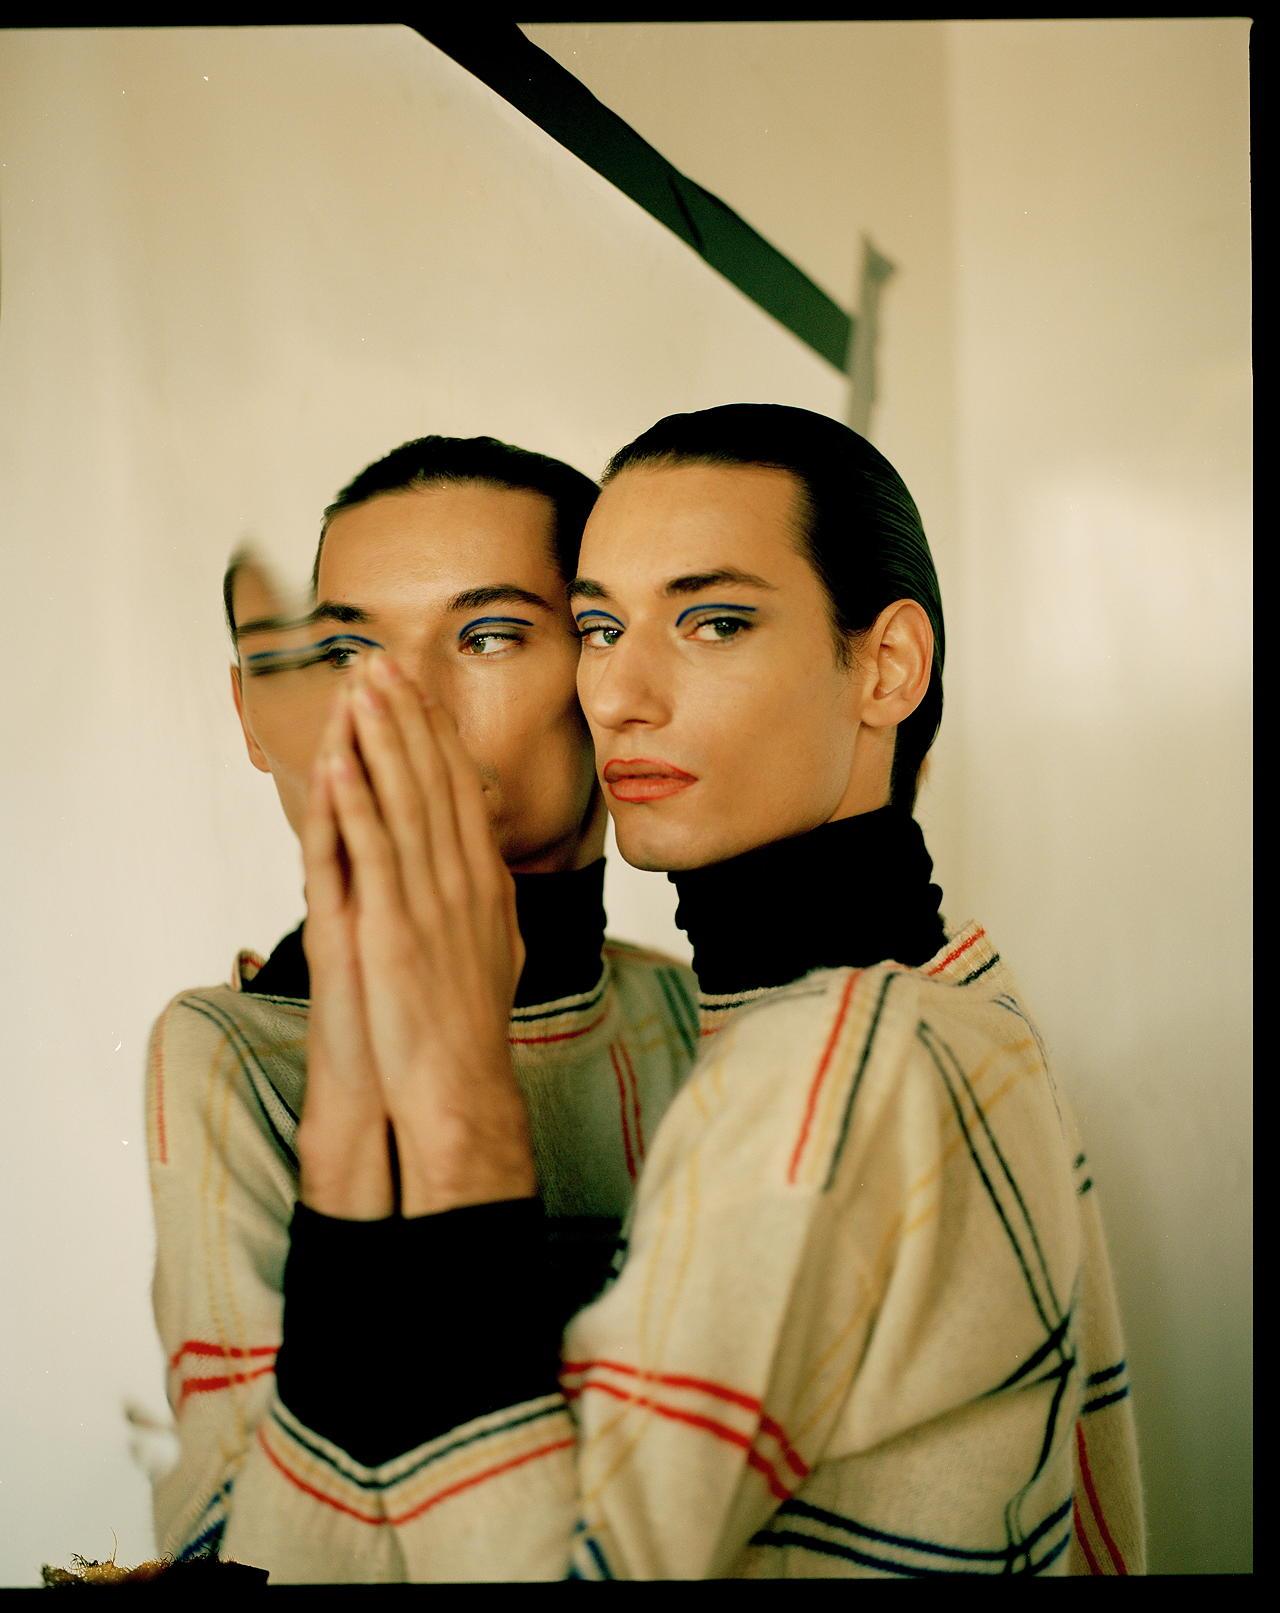 Olga Ush - Myself & I - Felix Schoeller Photoaward